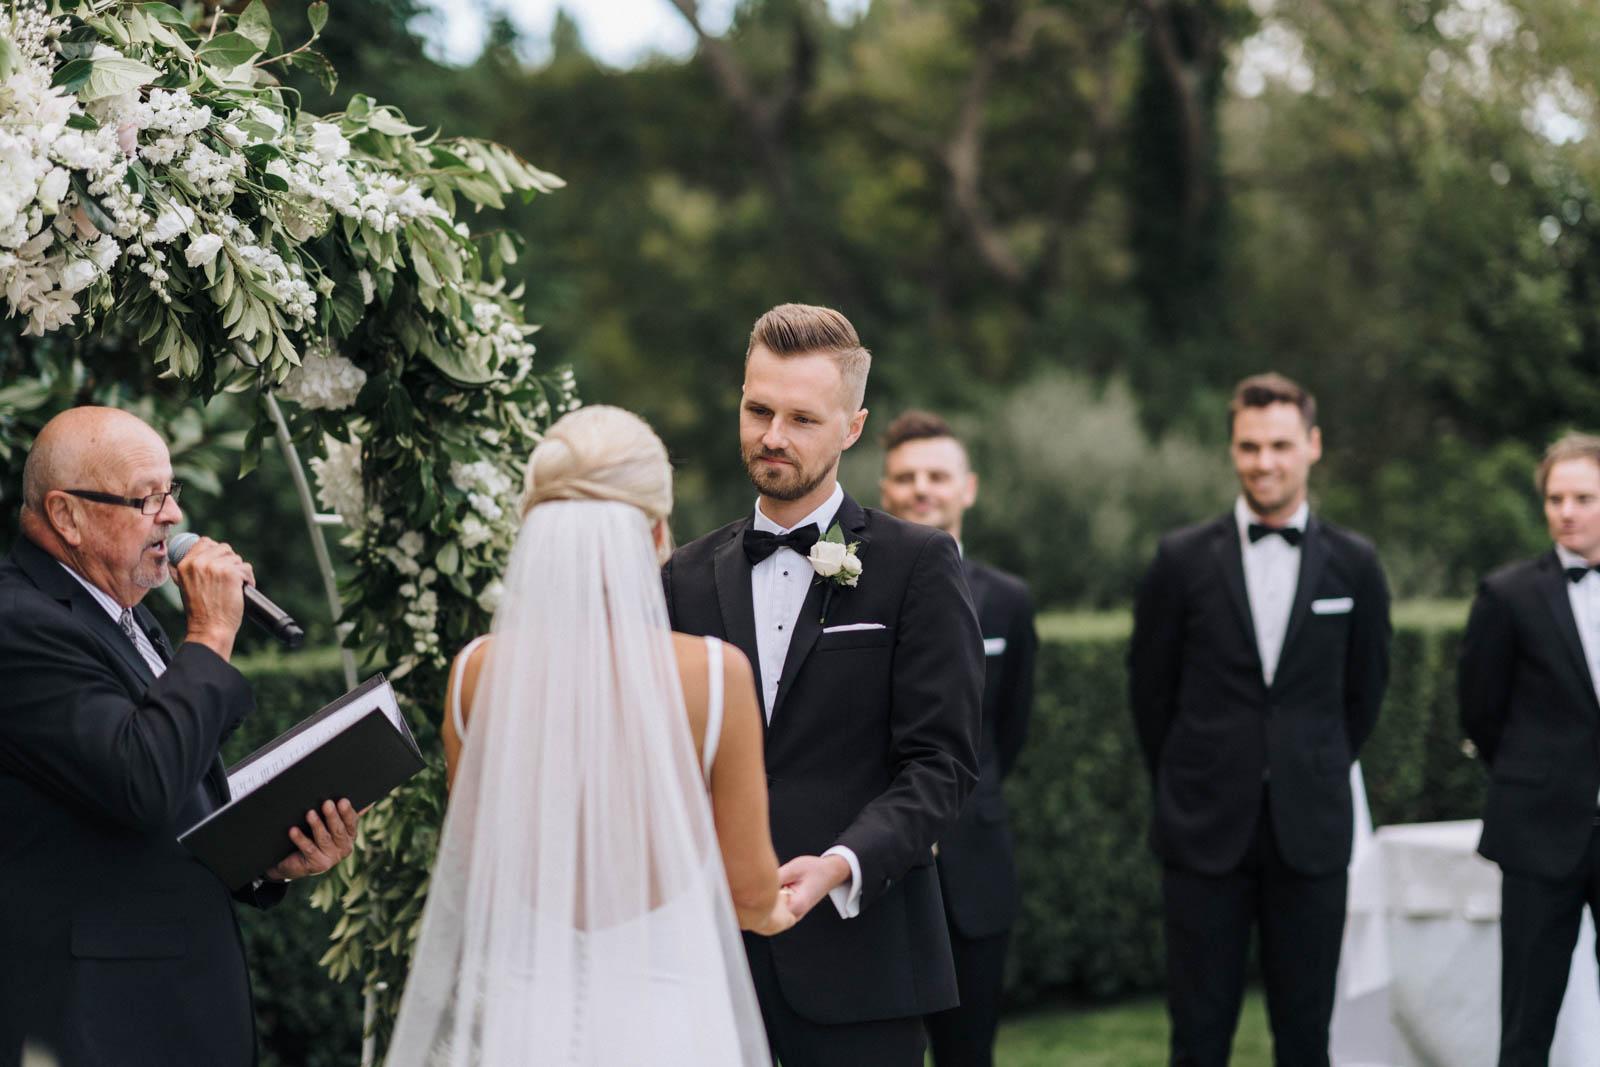 newfound-k-s-hilton-taupo-wedding-photographer-034